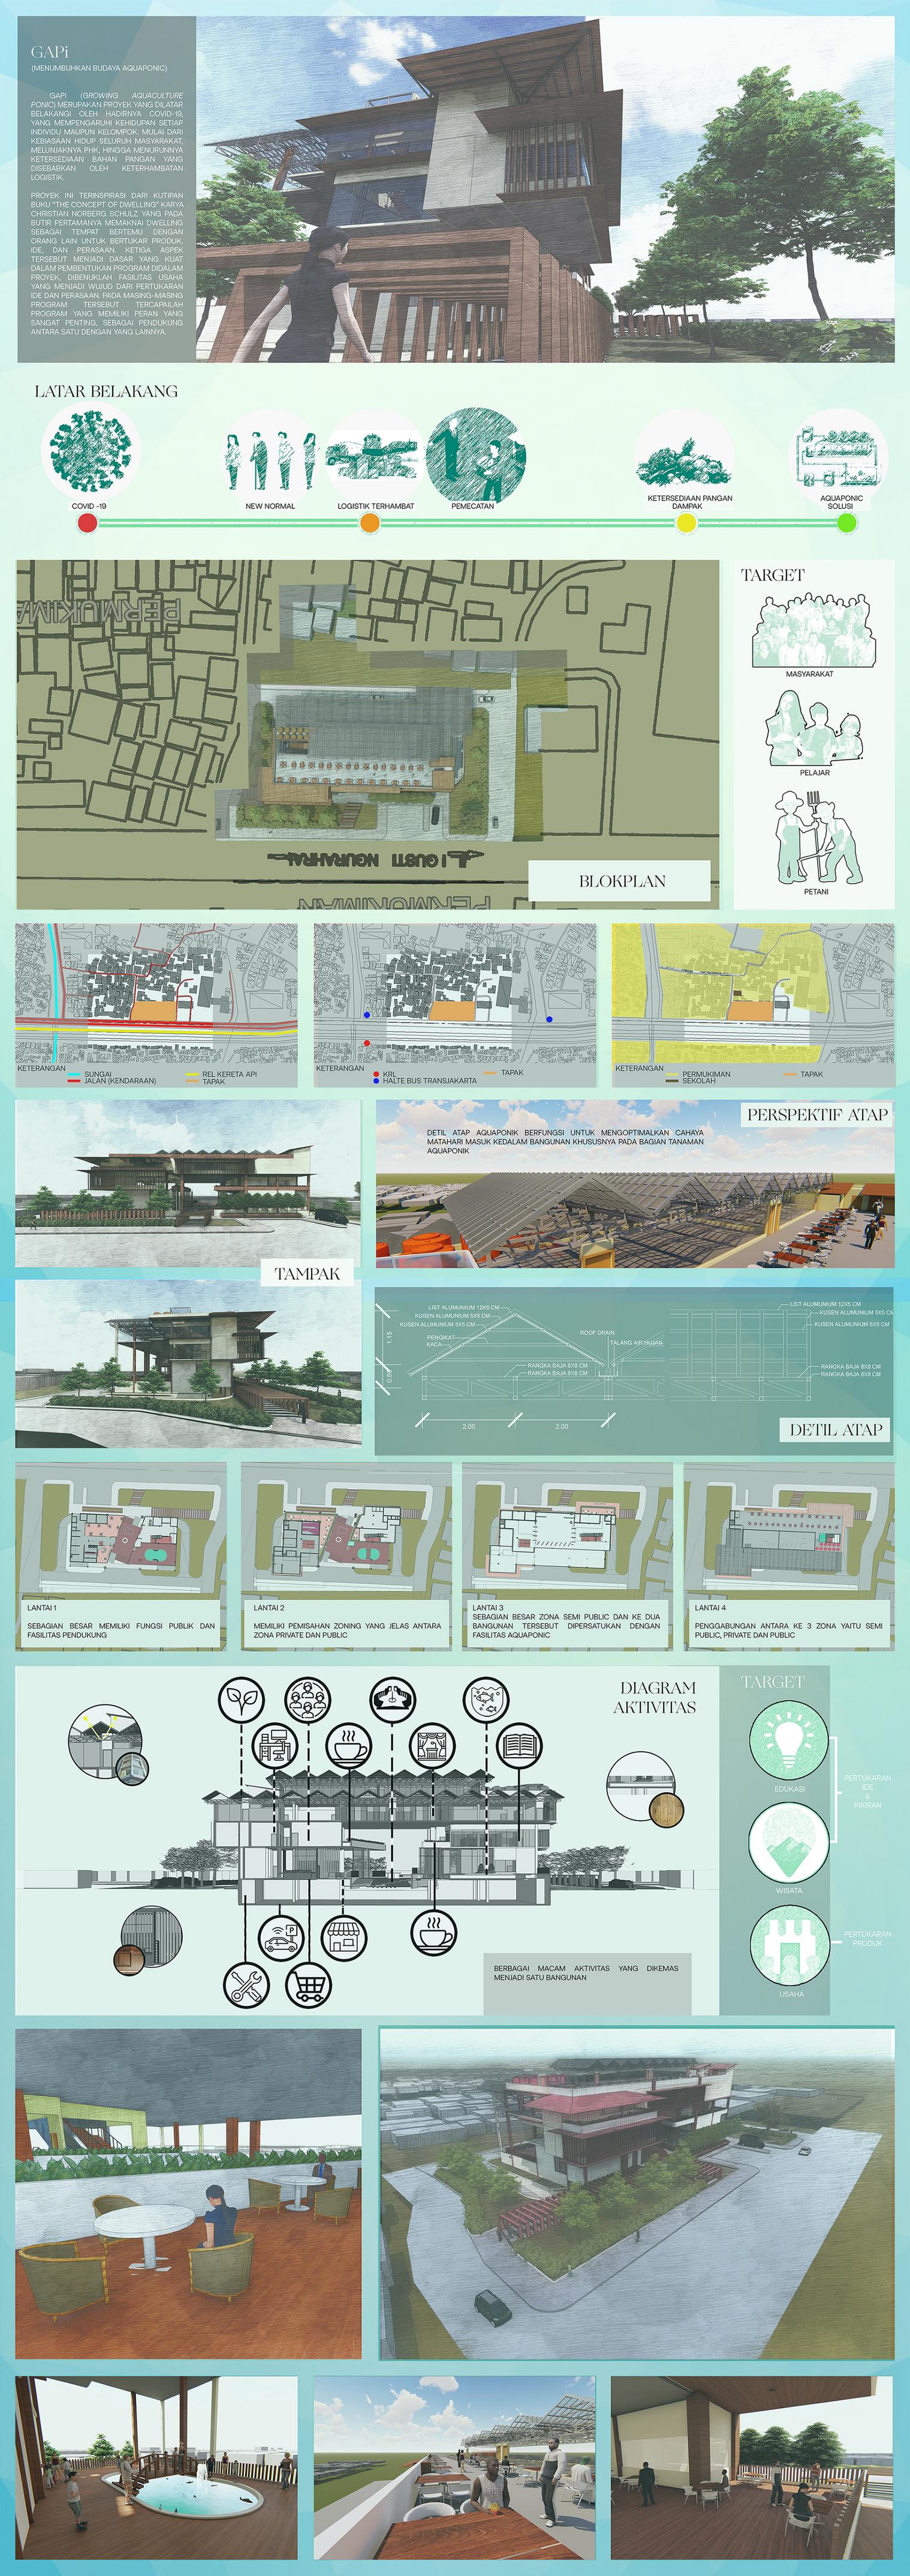 GAPi (Growing Aquaculture Ponic).png